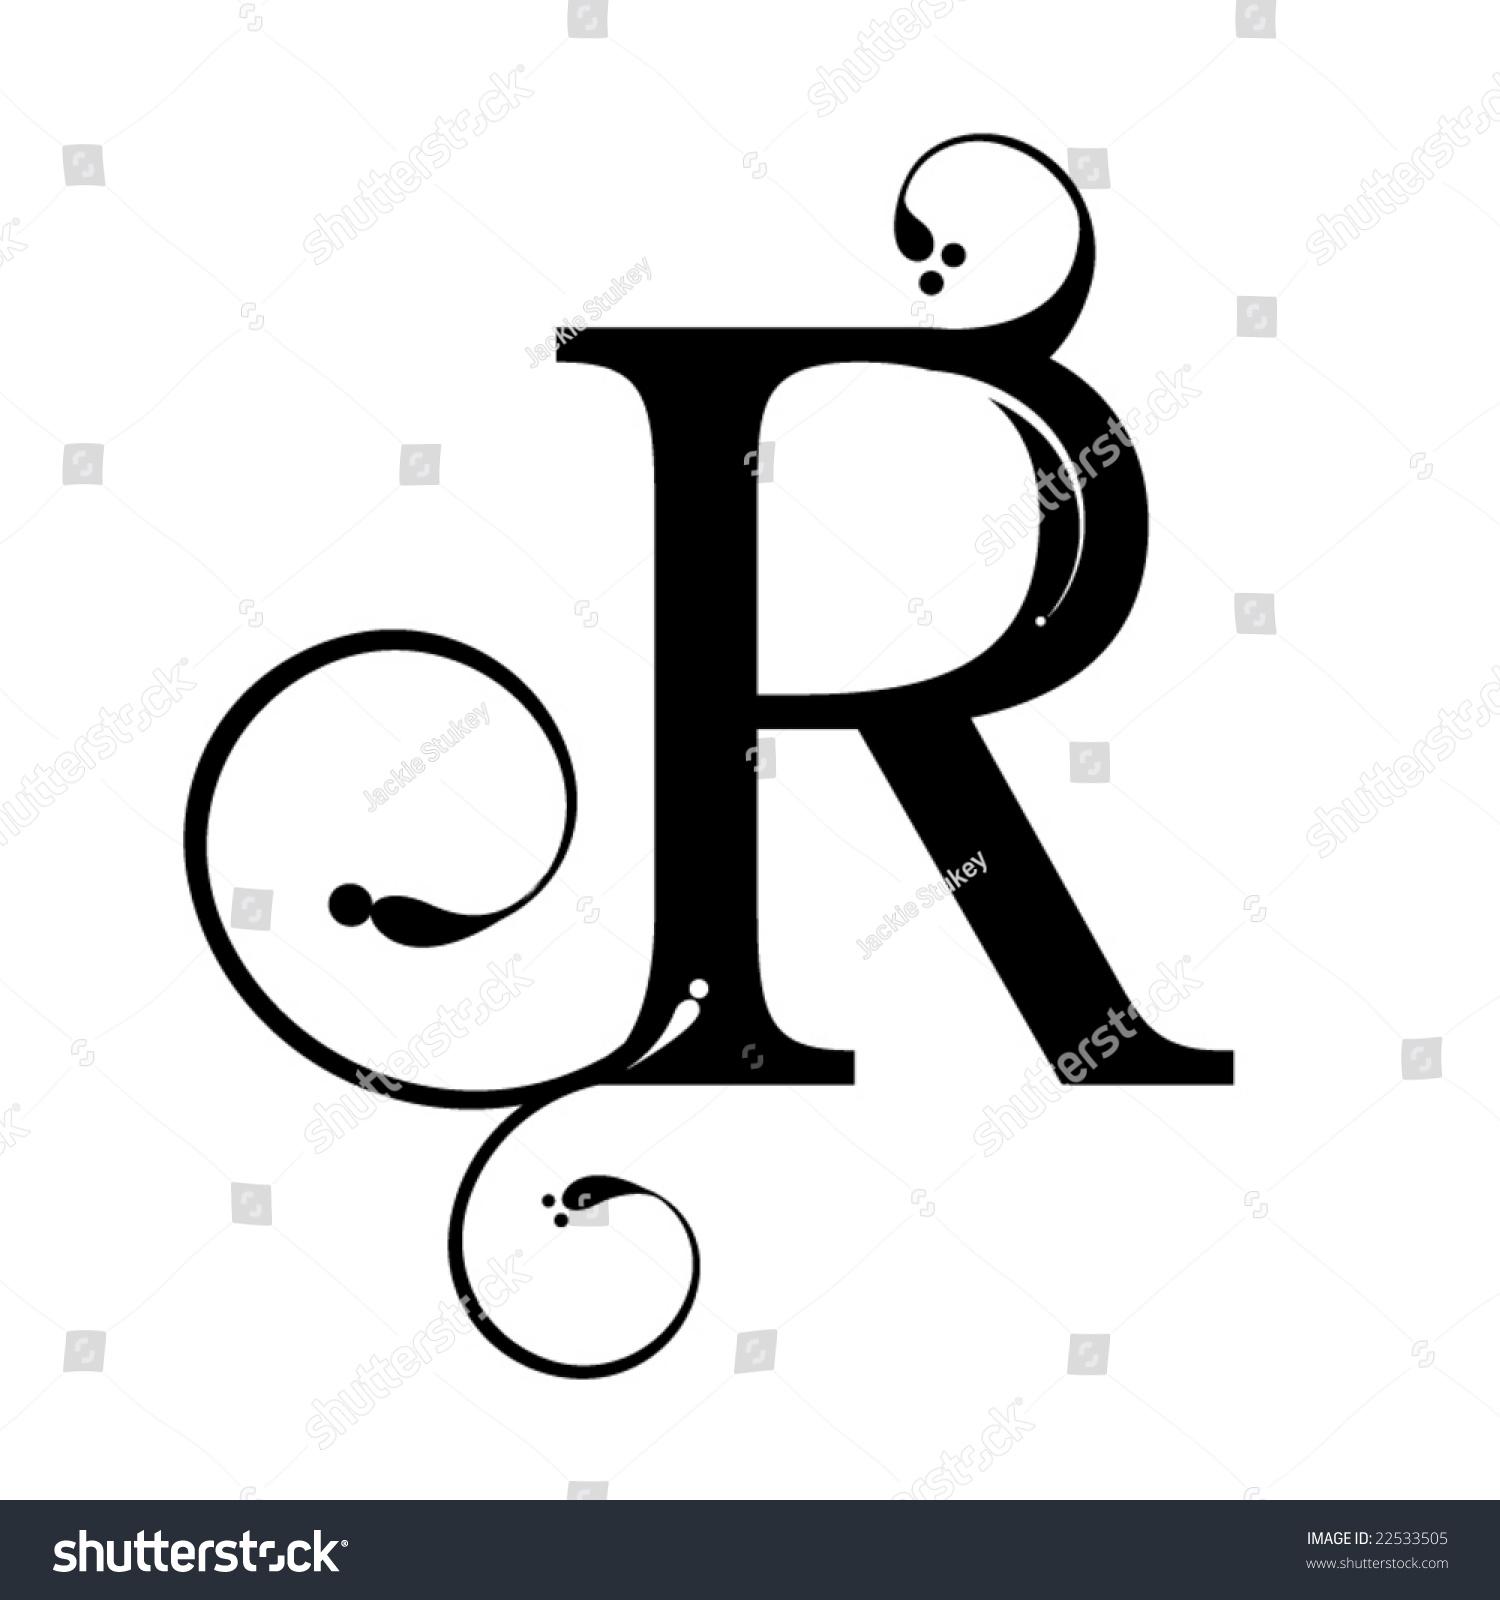 image letter r - photo #22